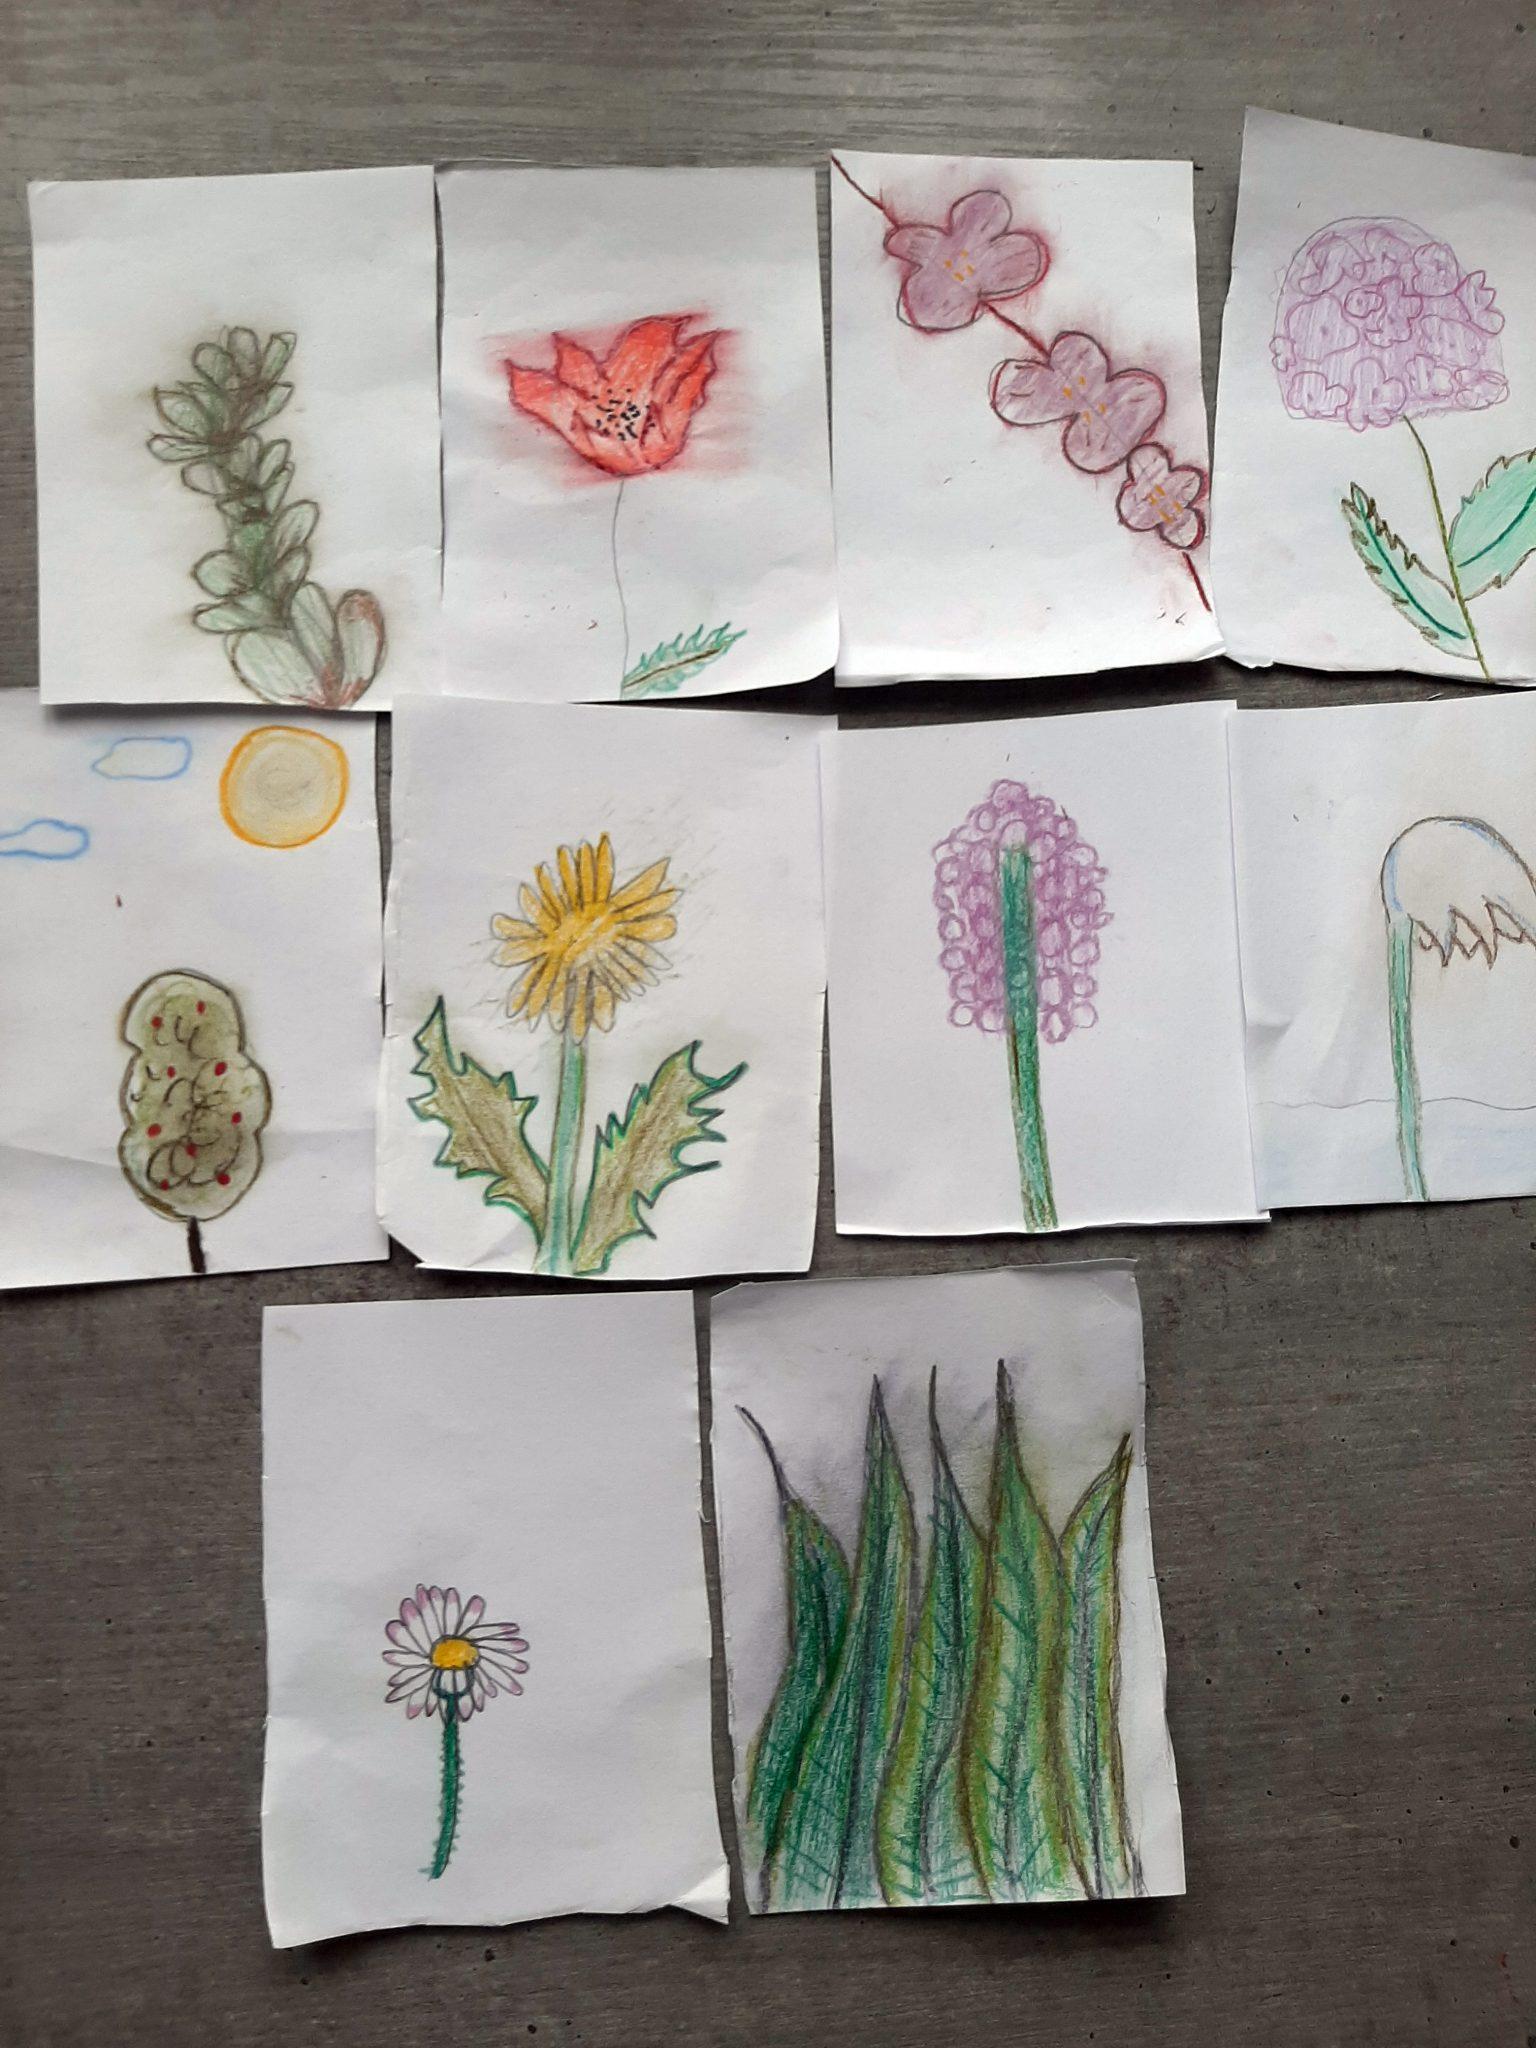 Kunst Valeria Loresch, 6a (3)